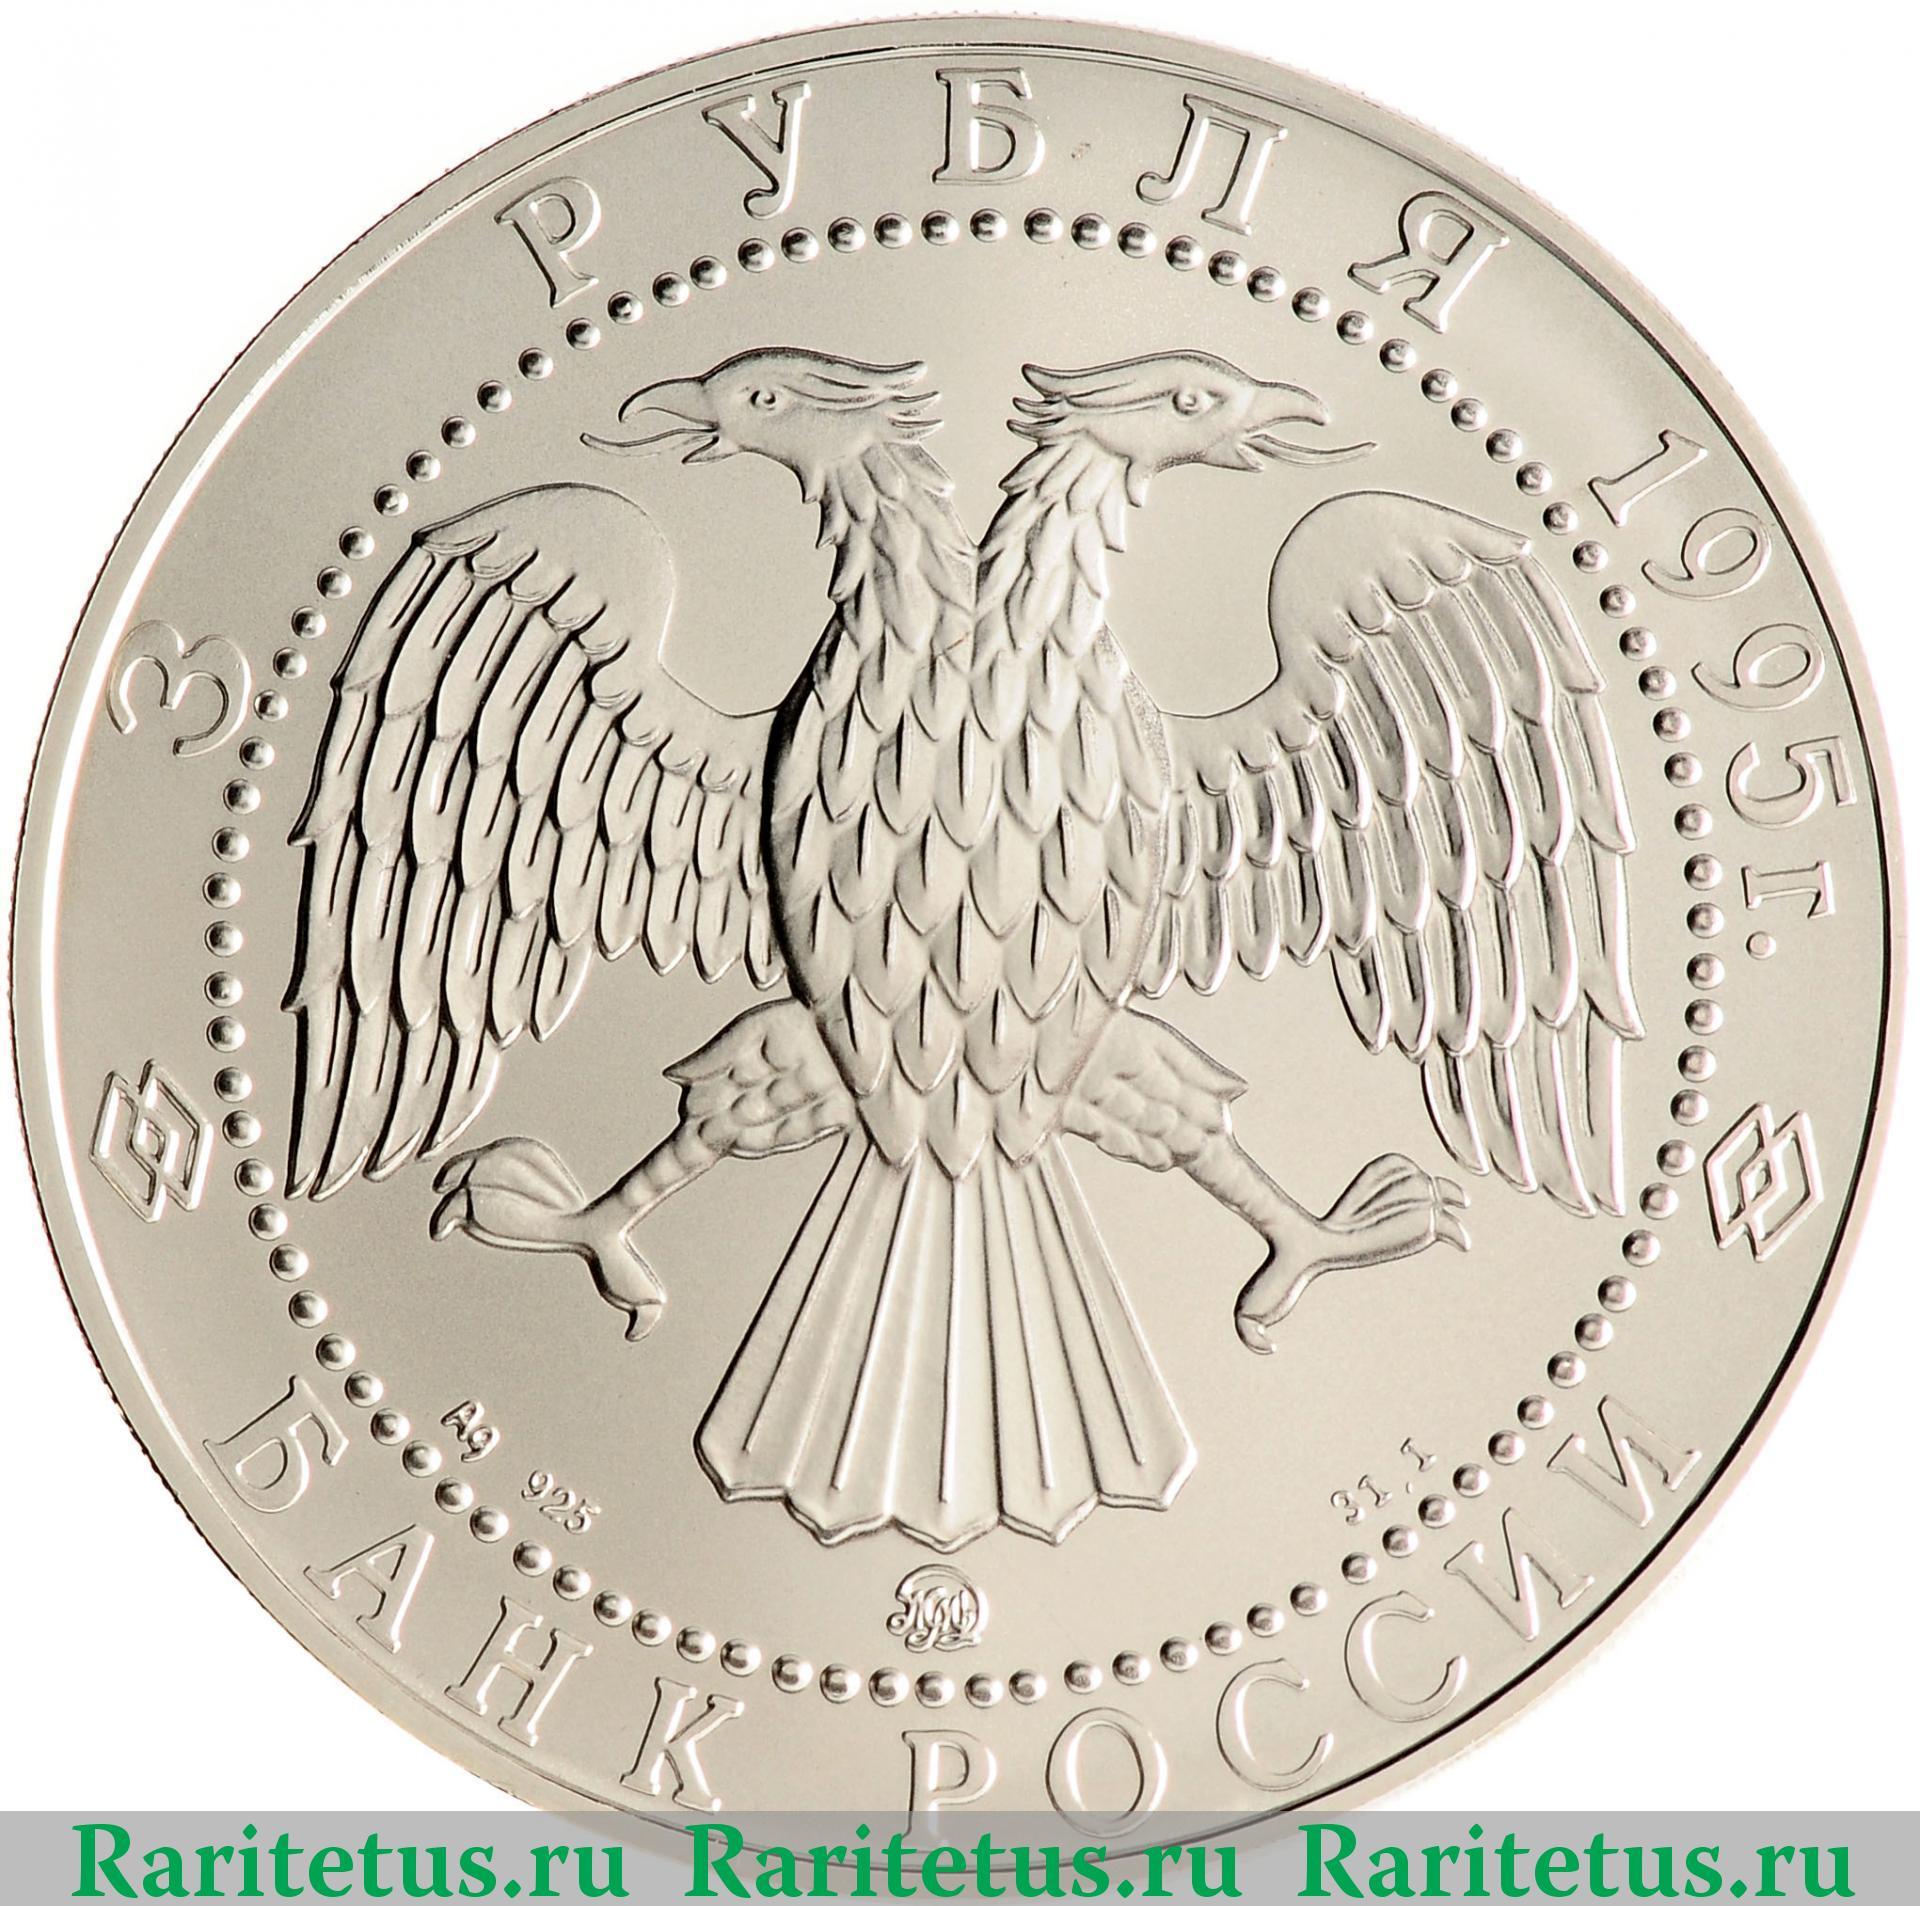 3 рубля соболь цена серебряная монета 2 доллара